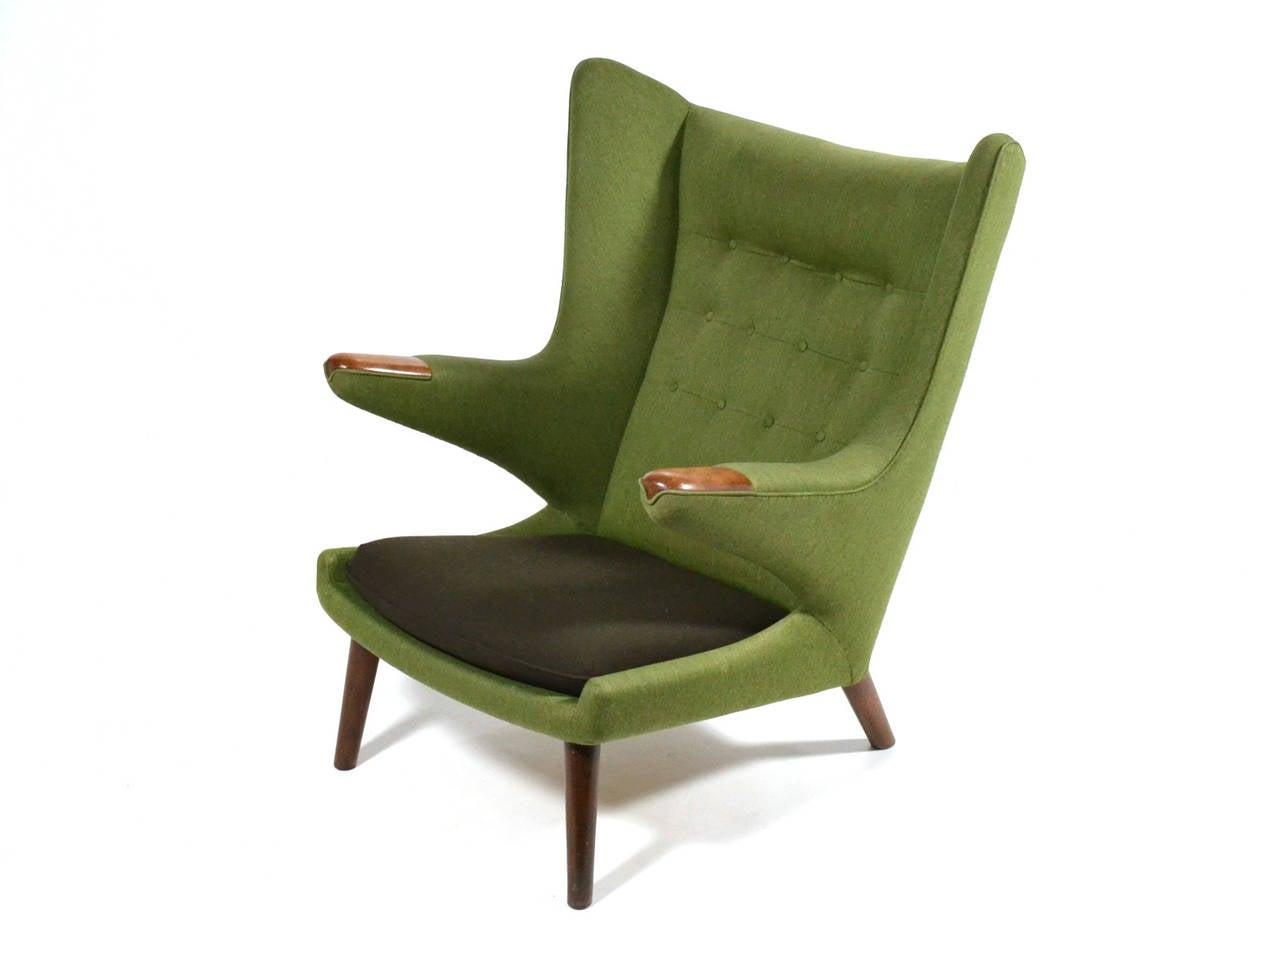 papa bear chair folding butterfly hans wegner for sale at 1stdibs